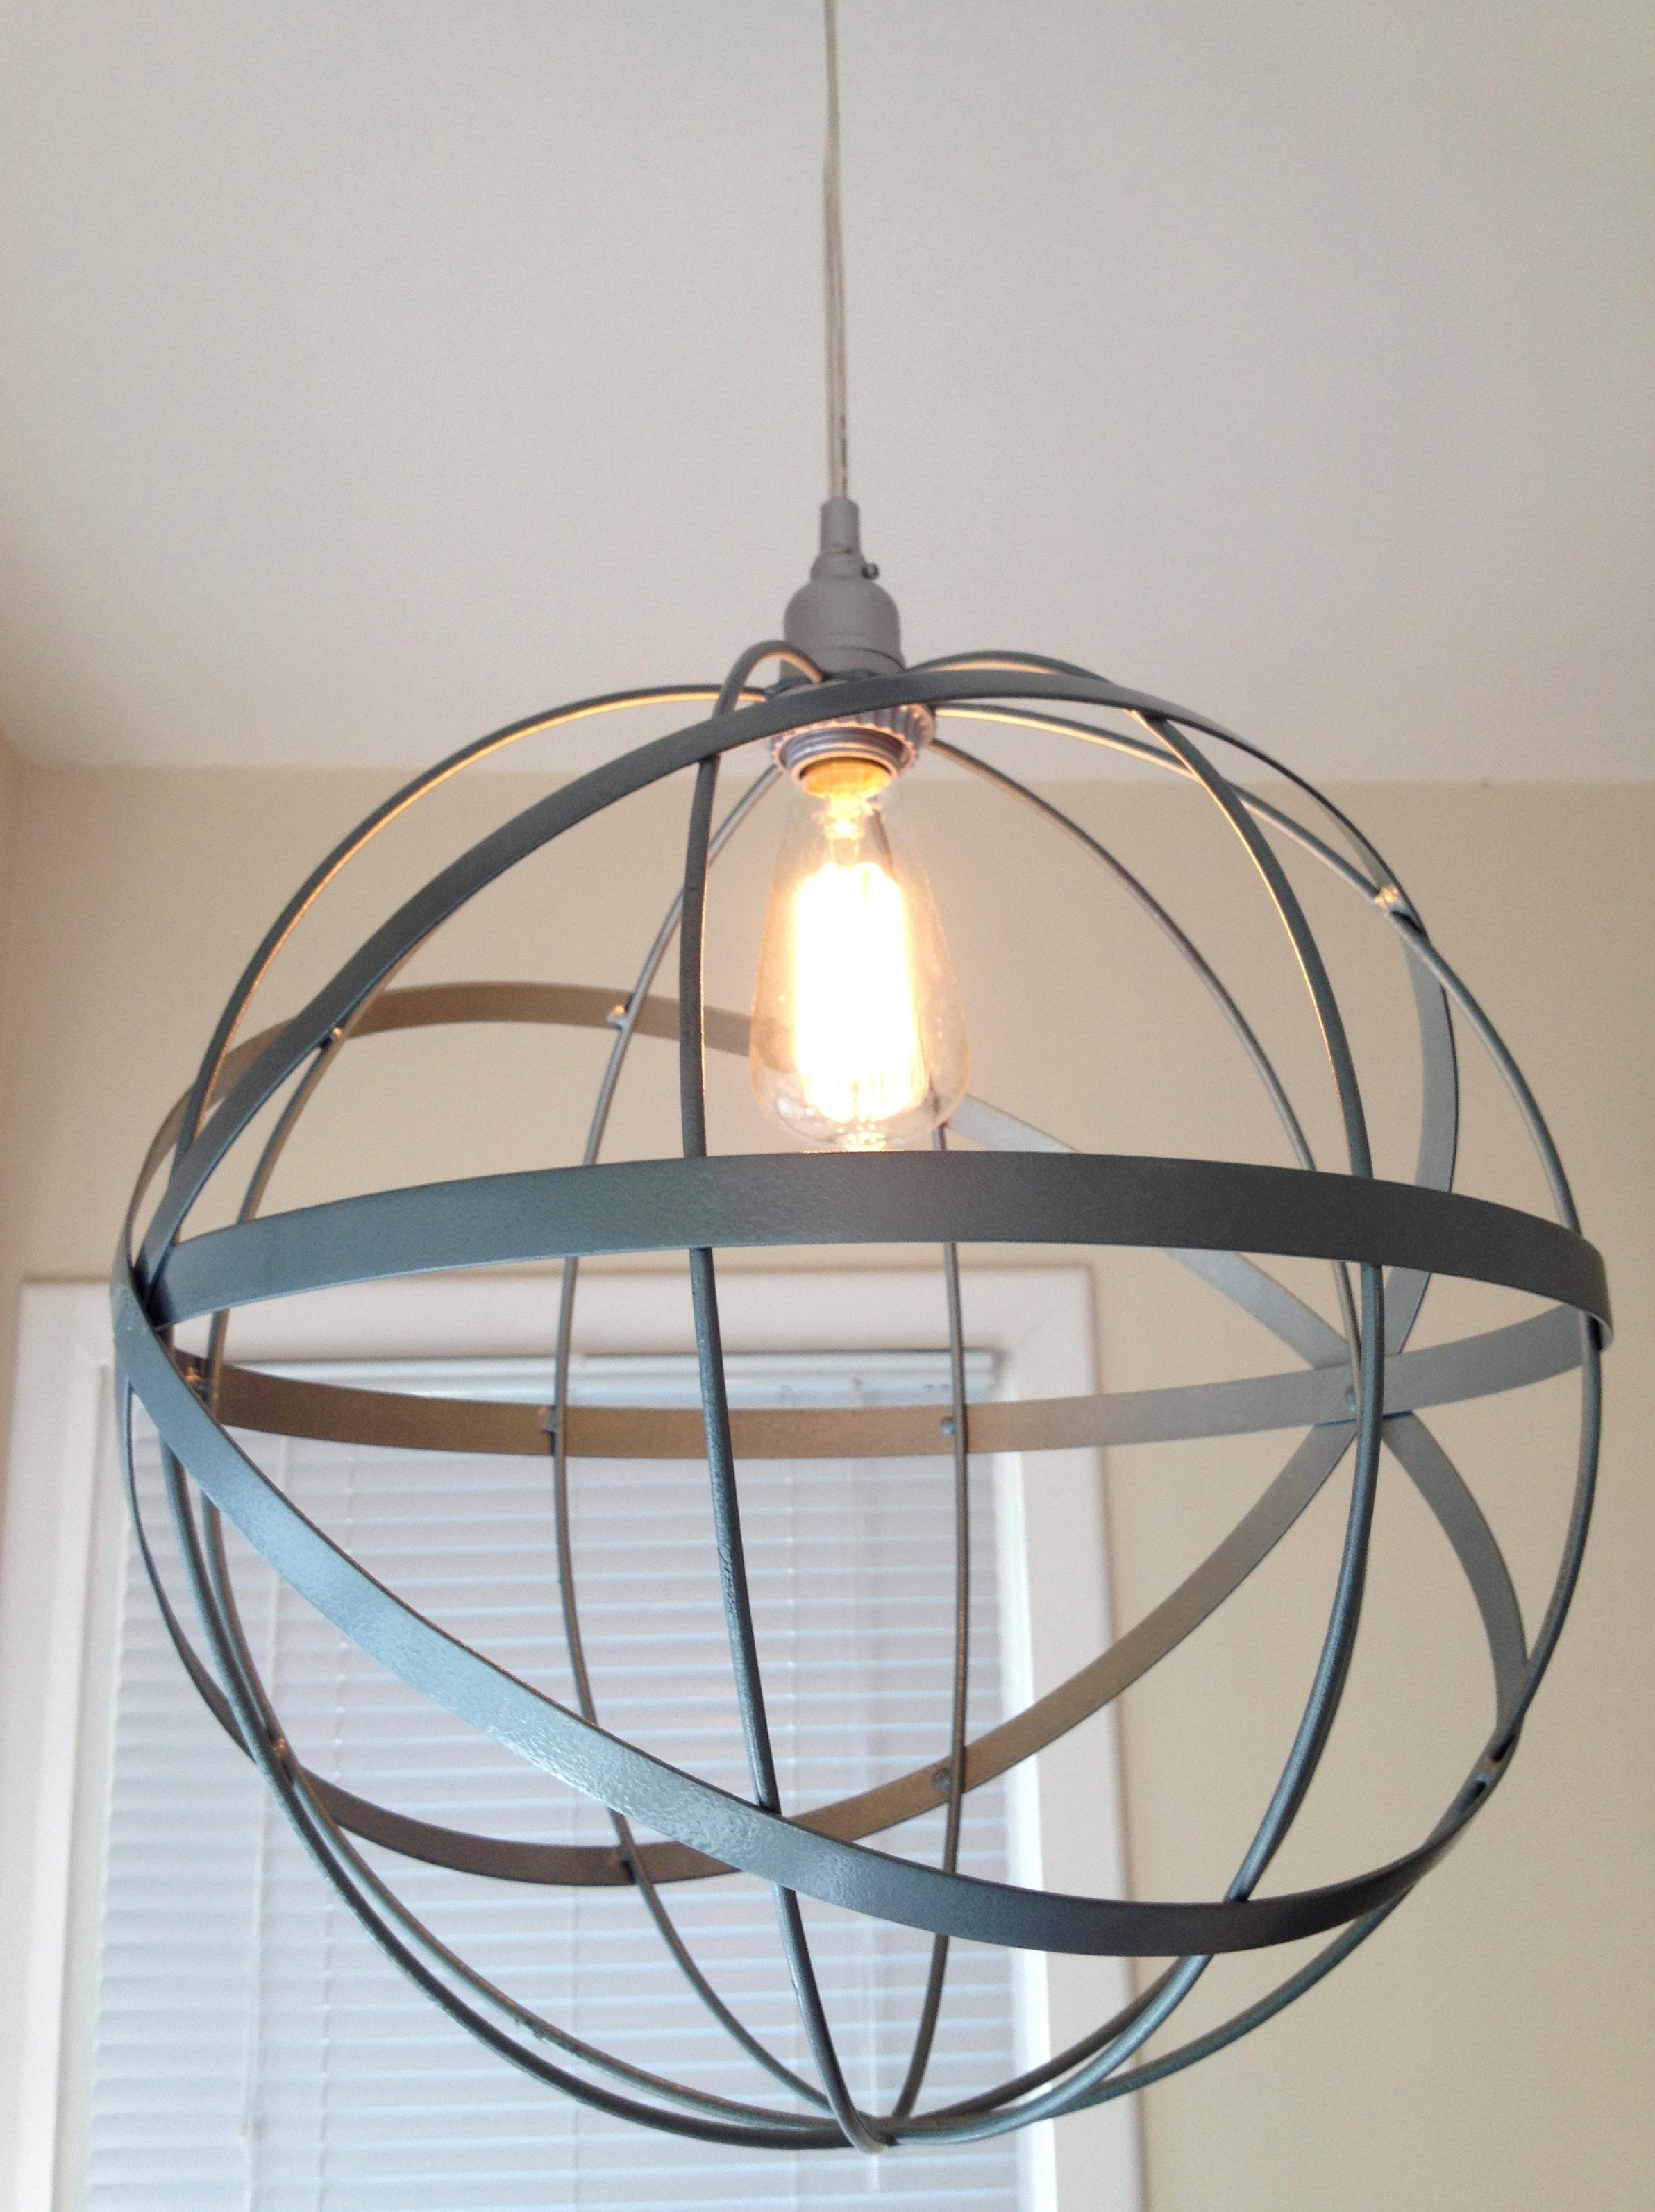 How to make a metal orb chandelier chandelier designs diy metal orb chandelier home design ideas aloadofball Images